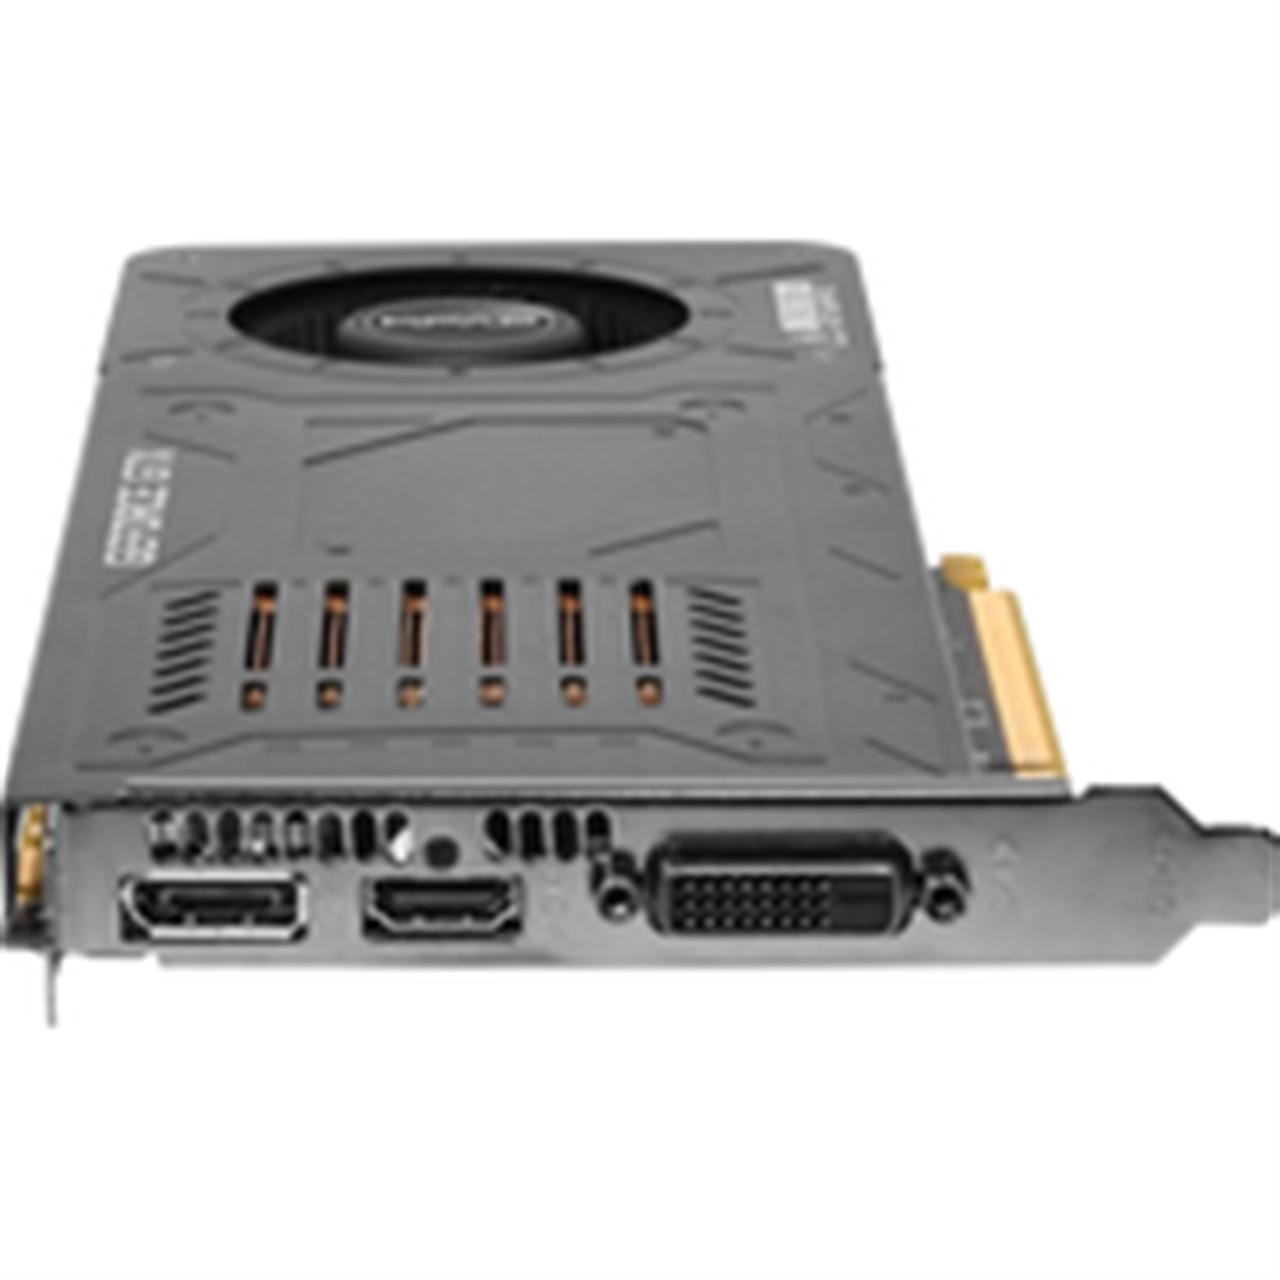 Scheda Video Nvidia Kfa2 Geforce Gtx 1070 Katana Daxstore Srls Vga Evga Ftw Gaming Acx 30 8gb Gddr5